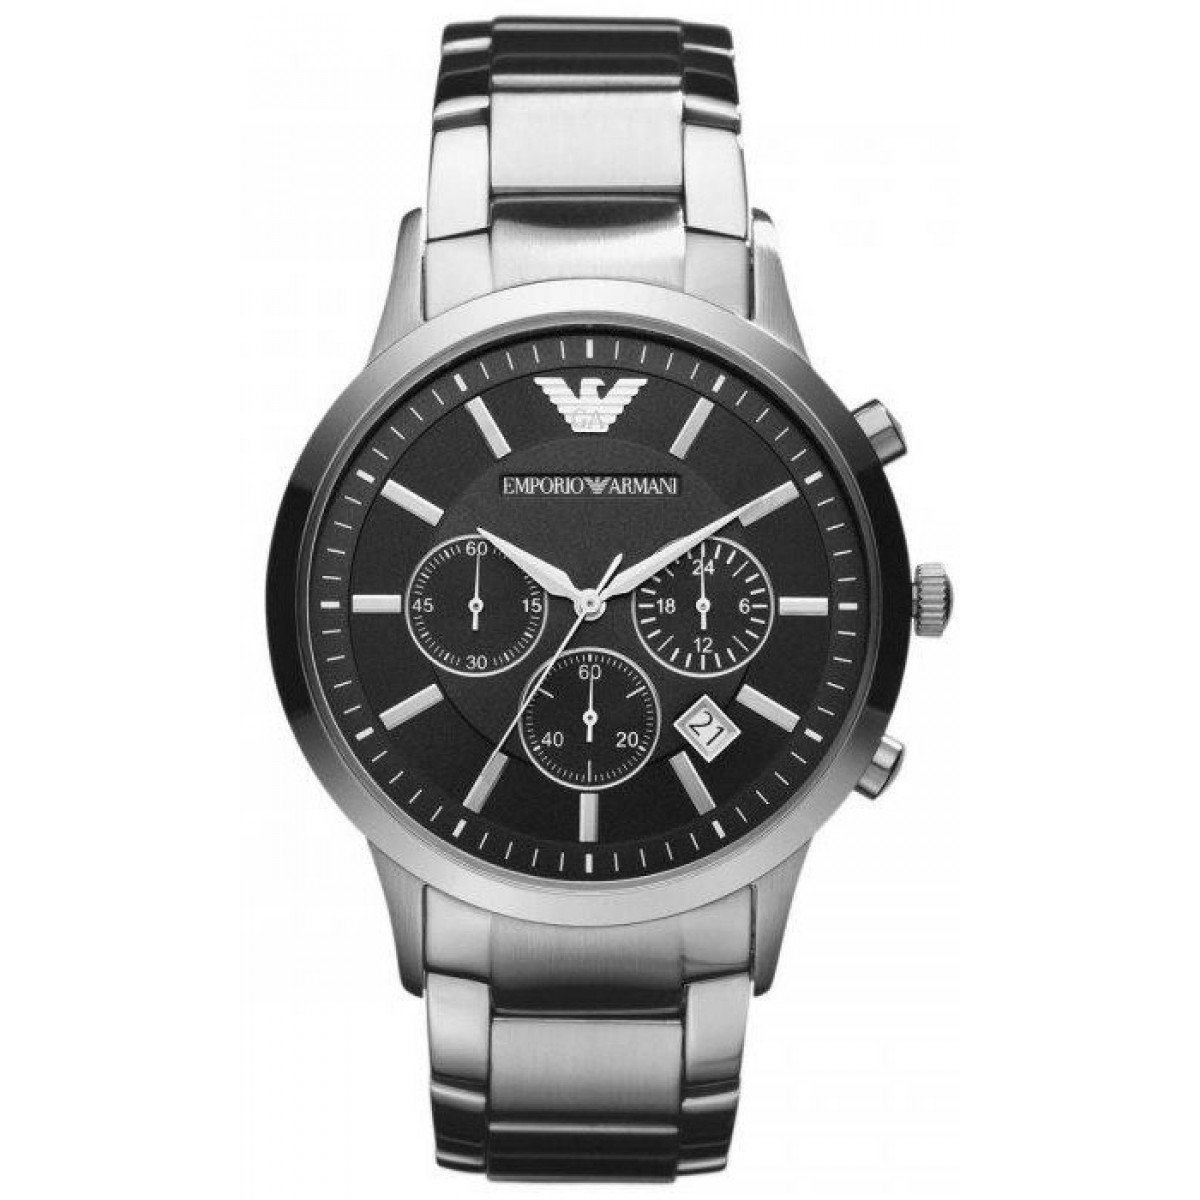 72c5c504b1c Relógio Emporio Armani Cronógrafo HAR2434Z